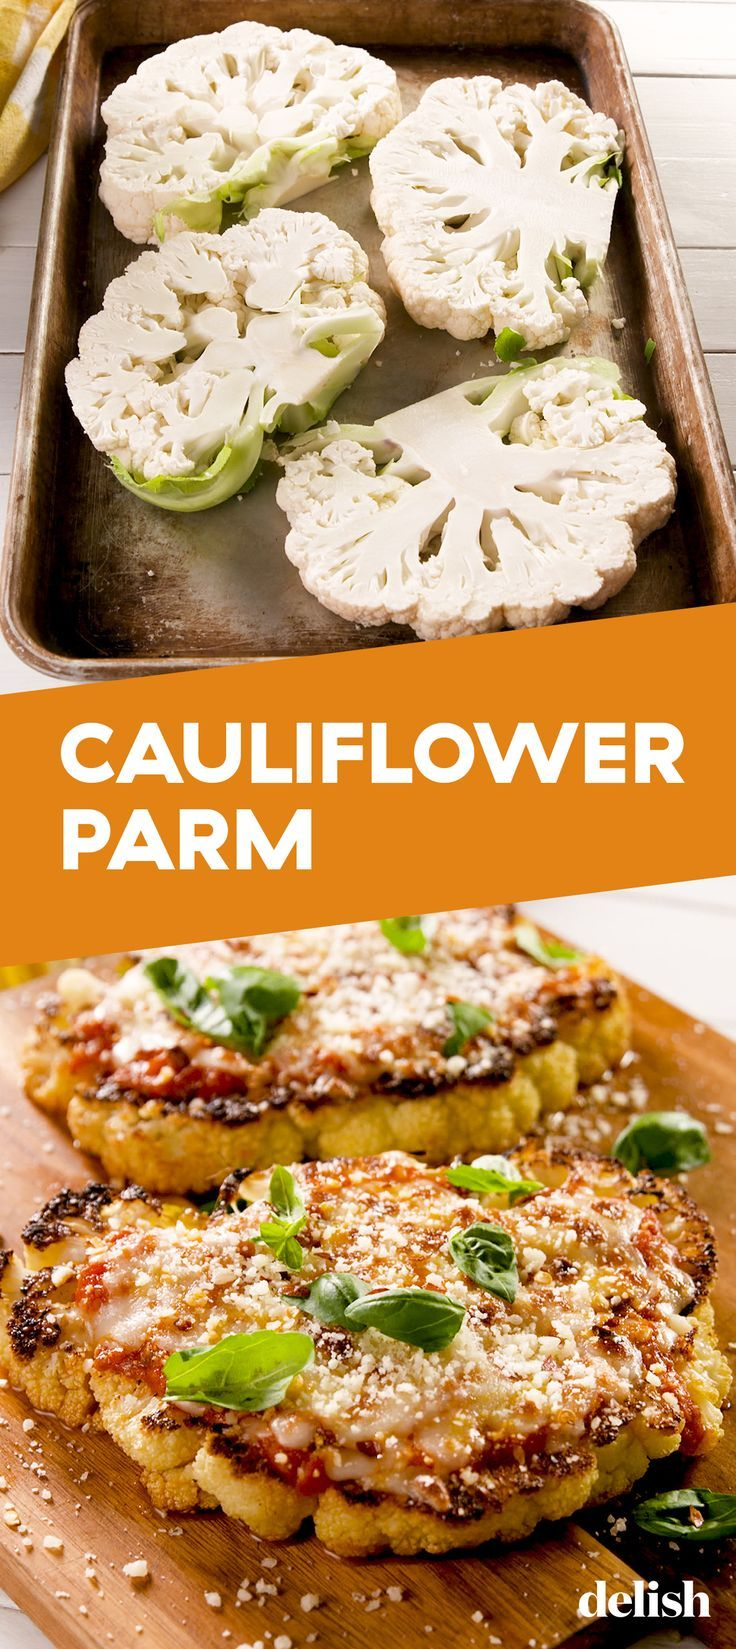 Cauliflower Parmesan Is Vegetarian Comfort Food At Its Finest